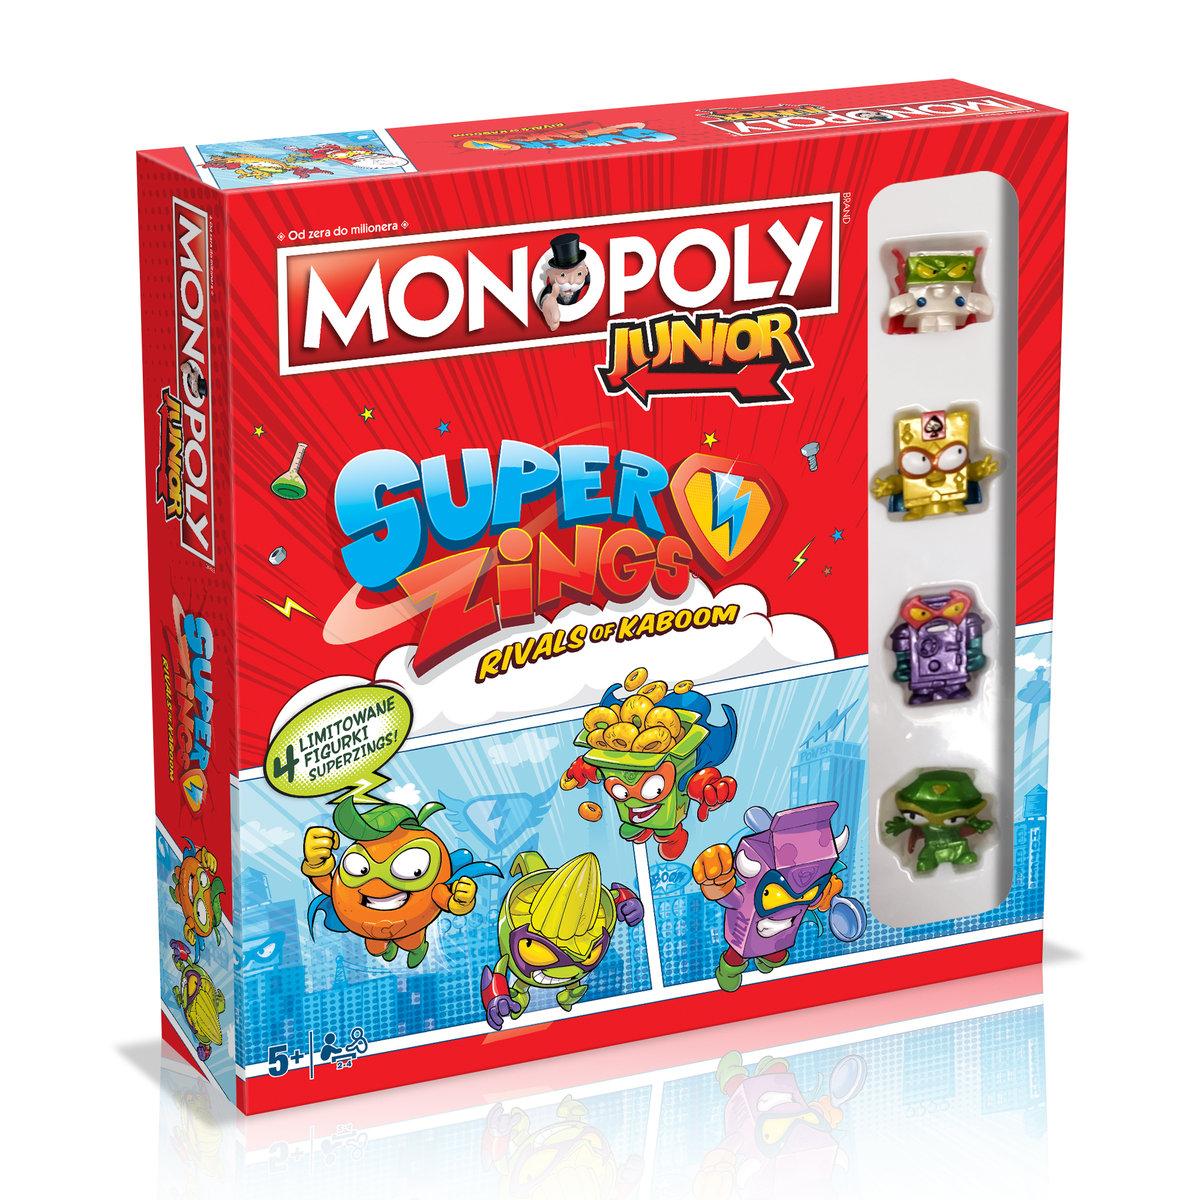 Monopoly Junior Super Zings (gra planszowa)